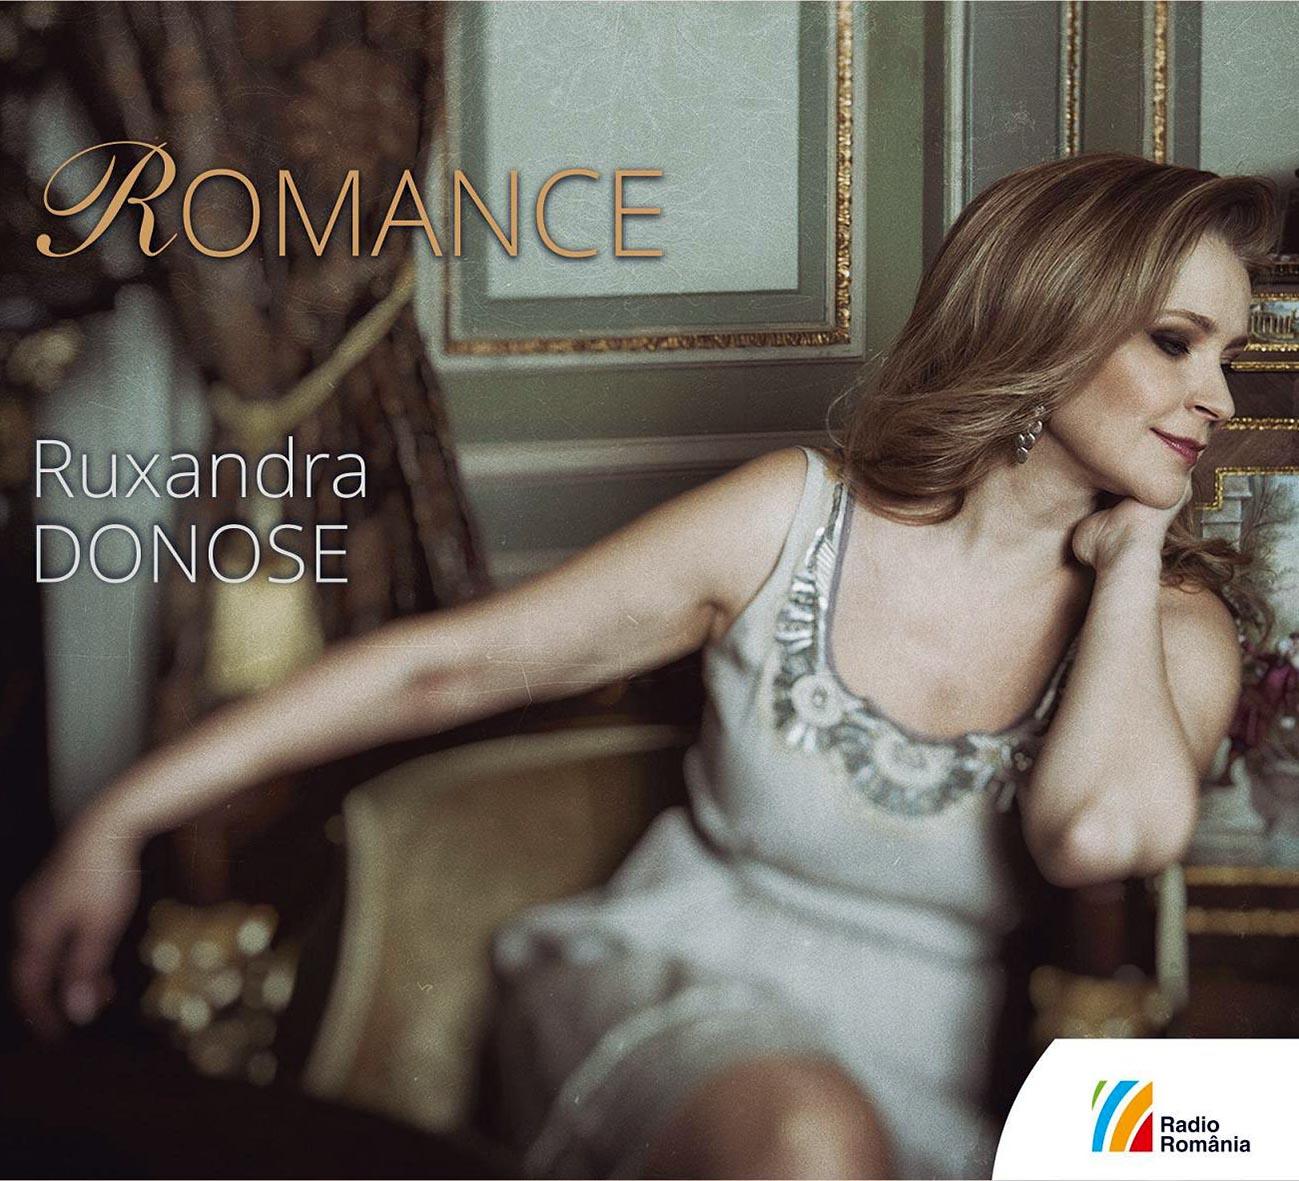 Ruxandra Donose Coperta Romance